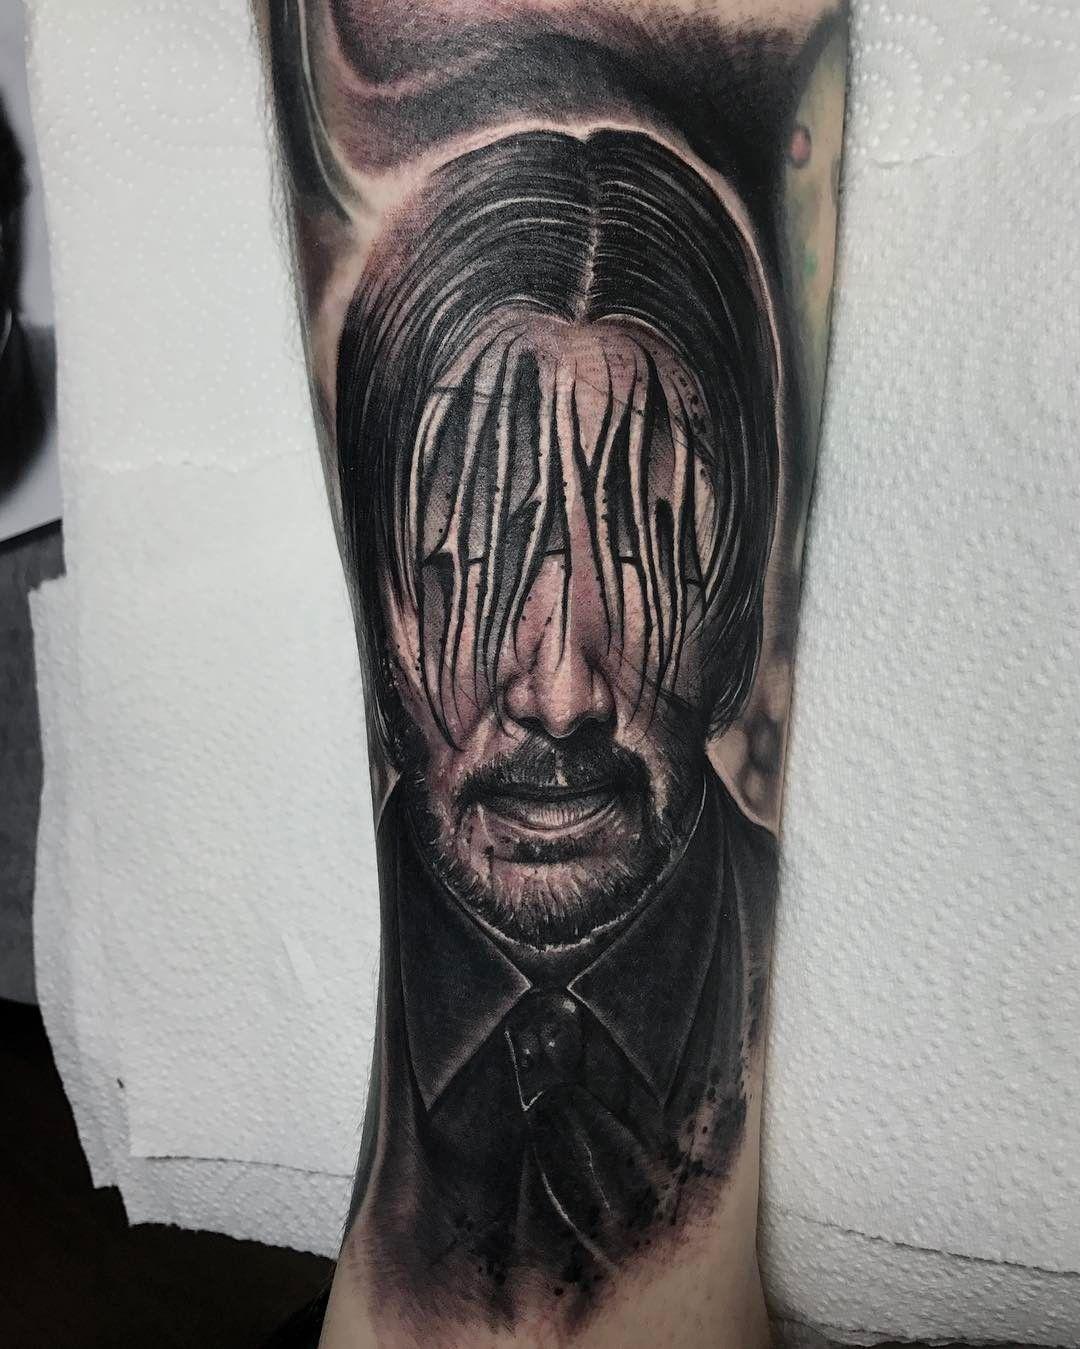 Tatuajes De John Wick: John Wick / Baba Yaga By Anrijs Straume (@ Anrijsstraume